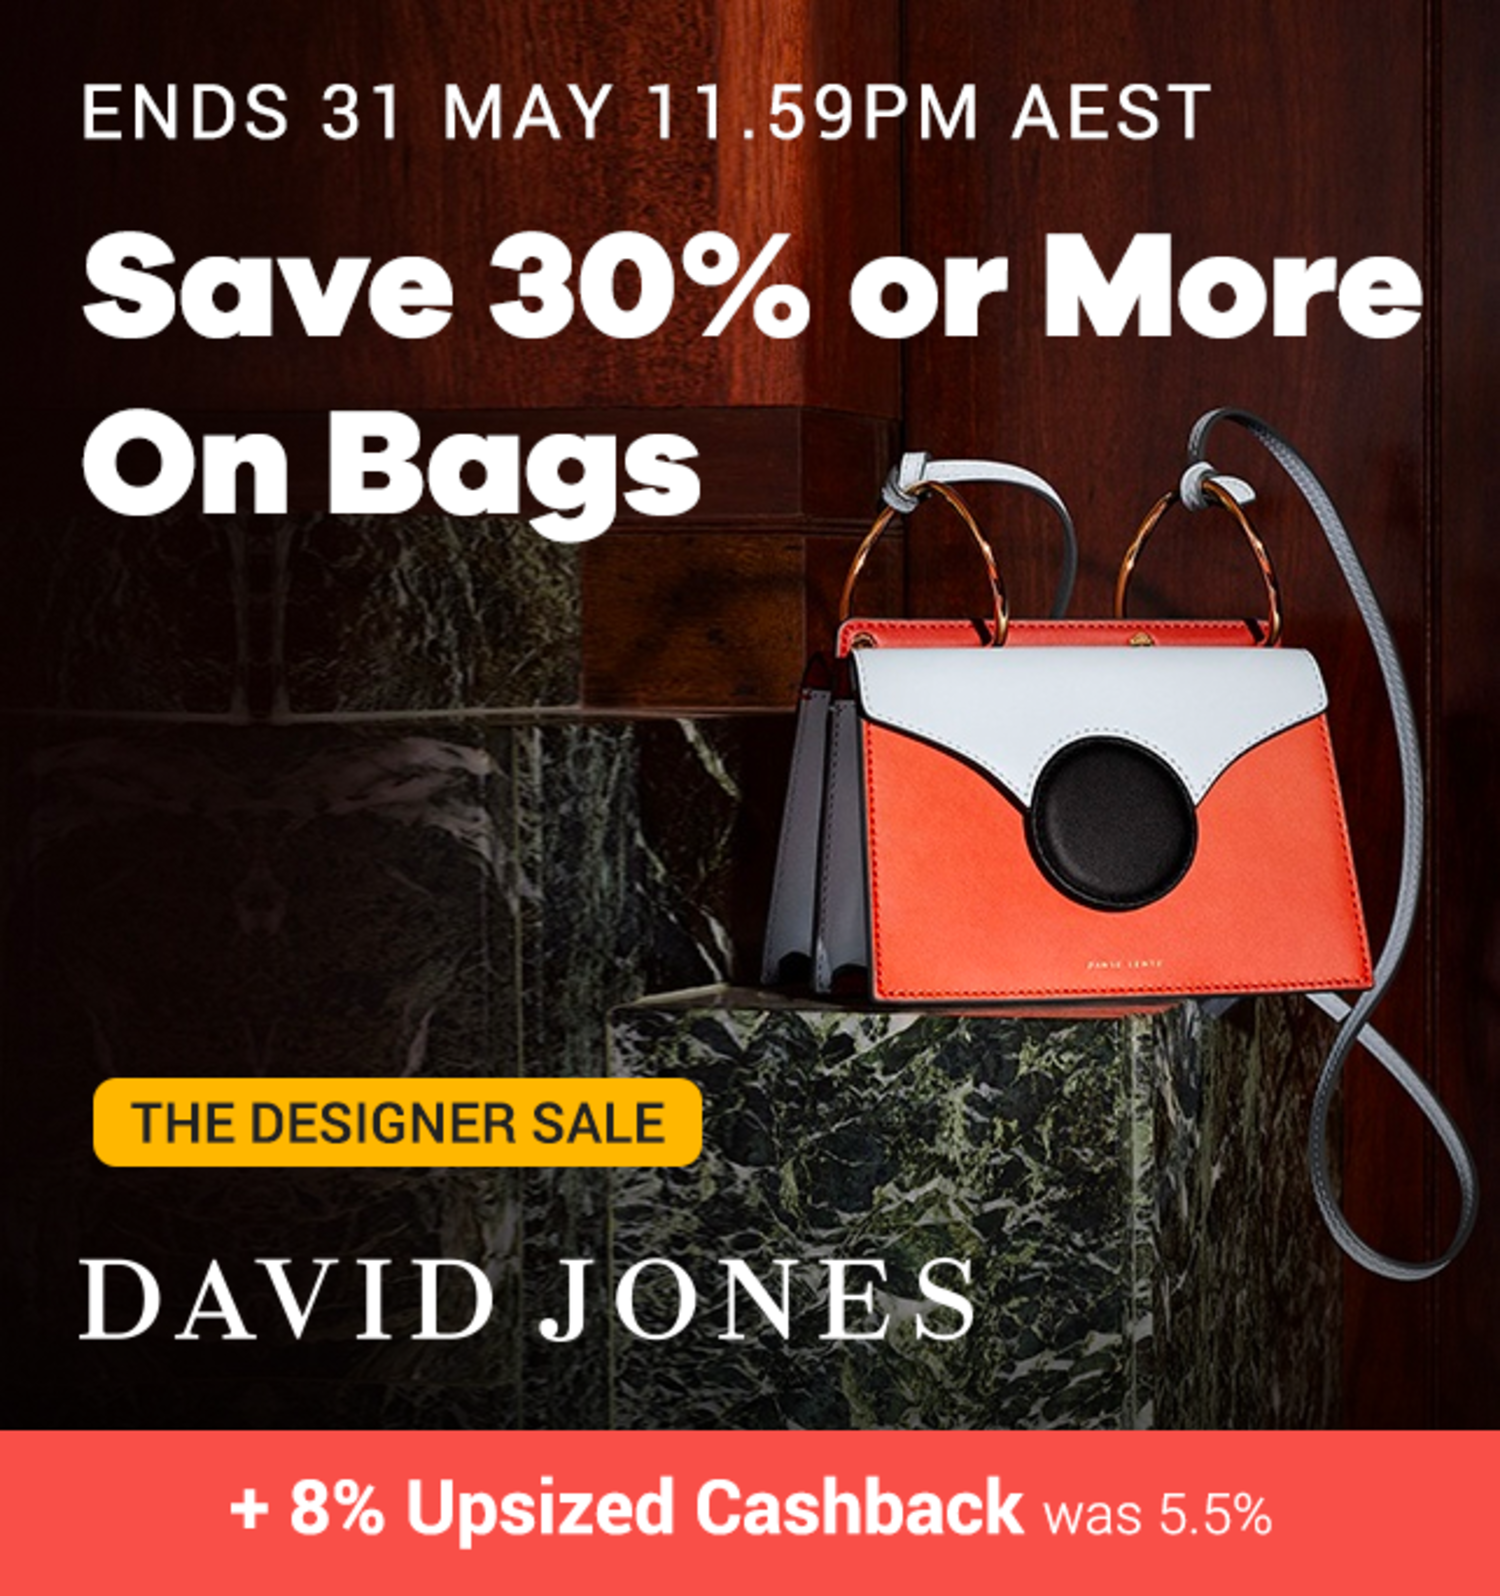 David Jones - Designer Sale